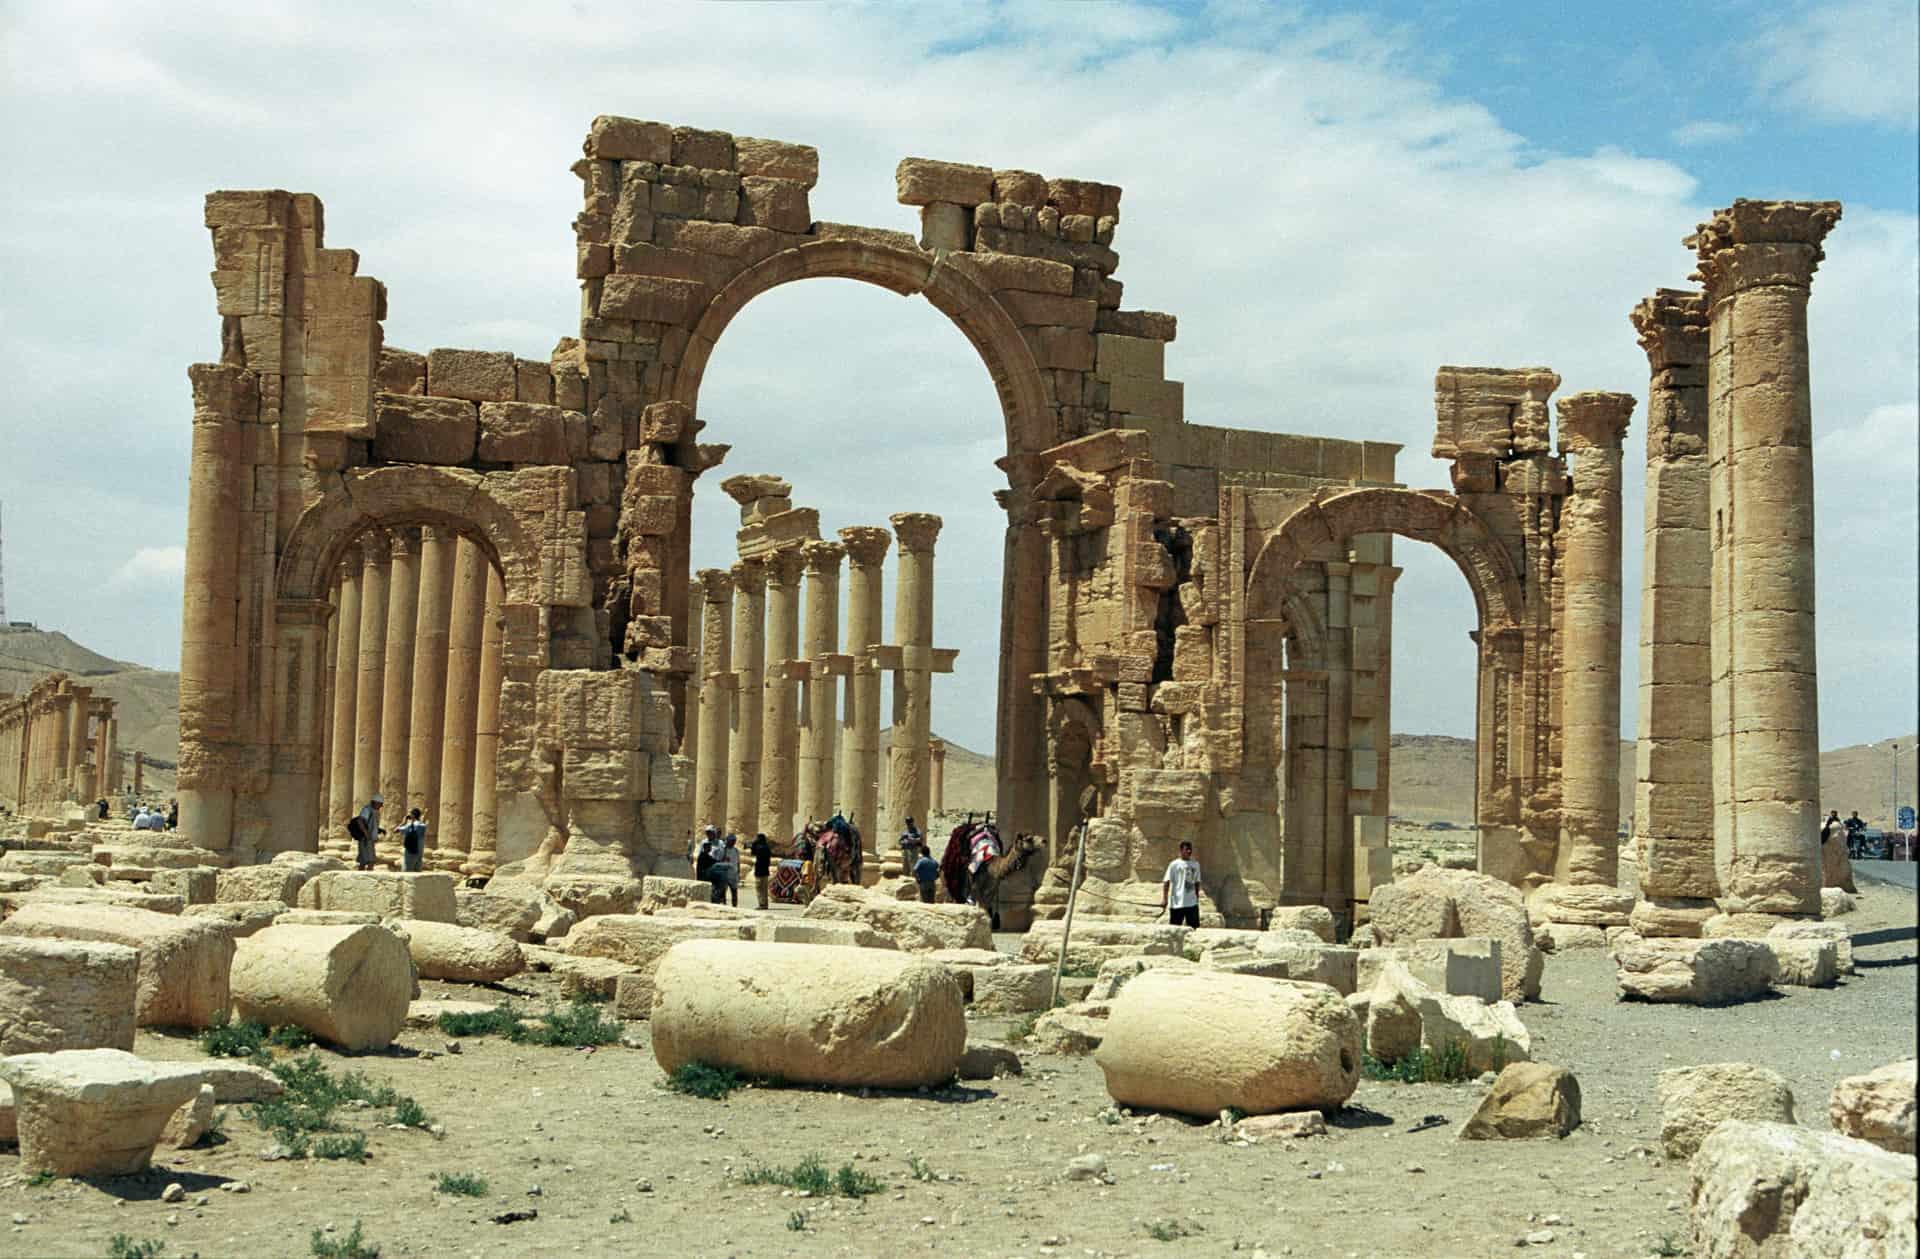 An arch in Palmyra's colonnade.